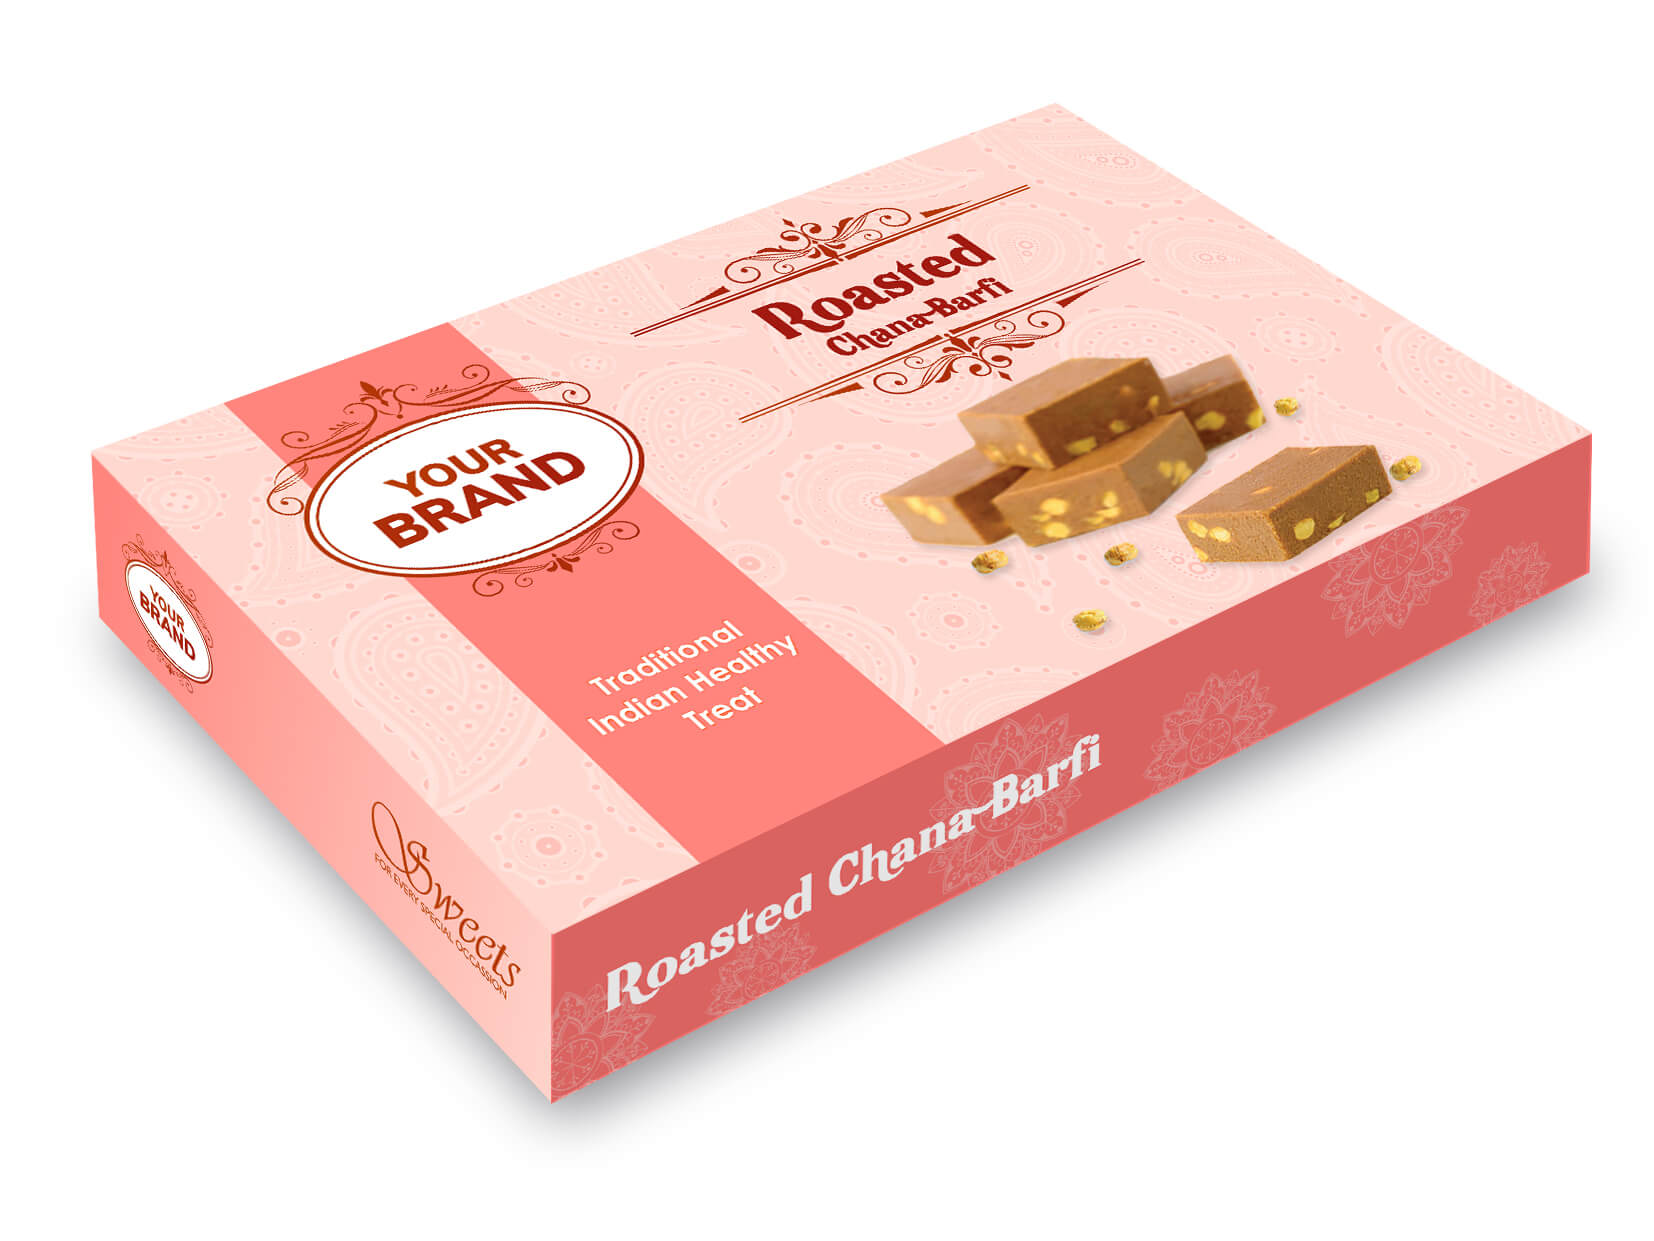 Roasted Chana Barfi Box - Your Brand